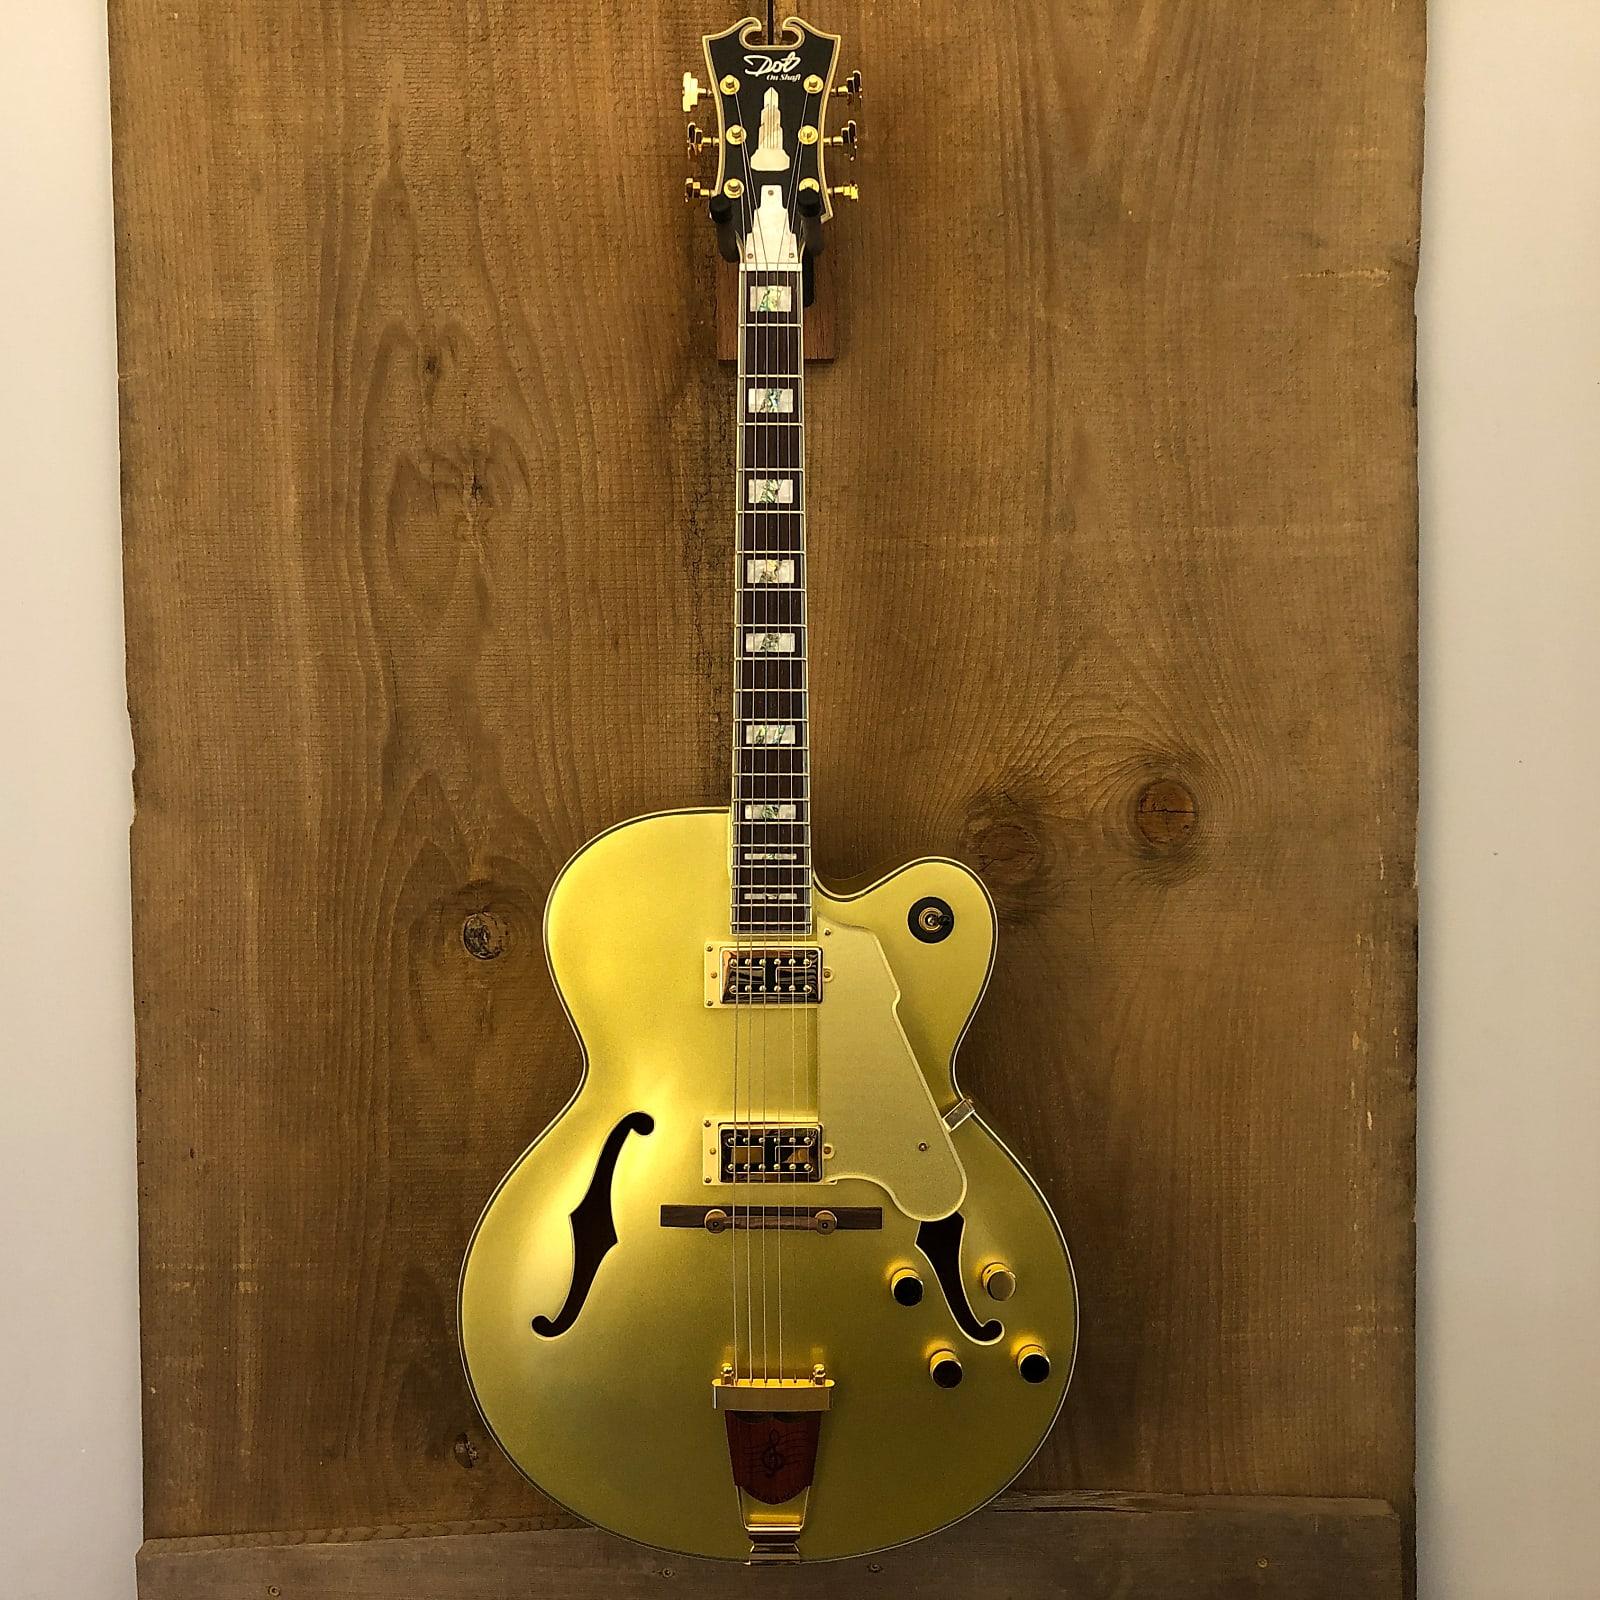 Dot on Shaft Carparelli Hollow Body Archtop Guitar Gold Metallic w/ Hard Case